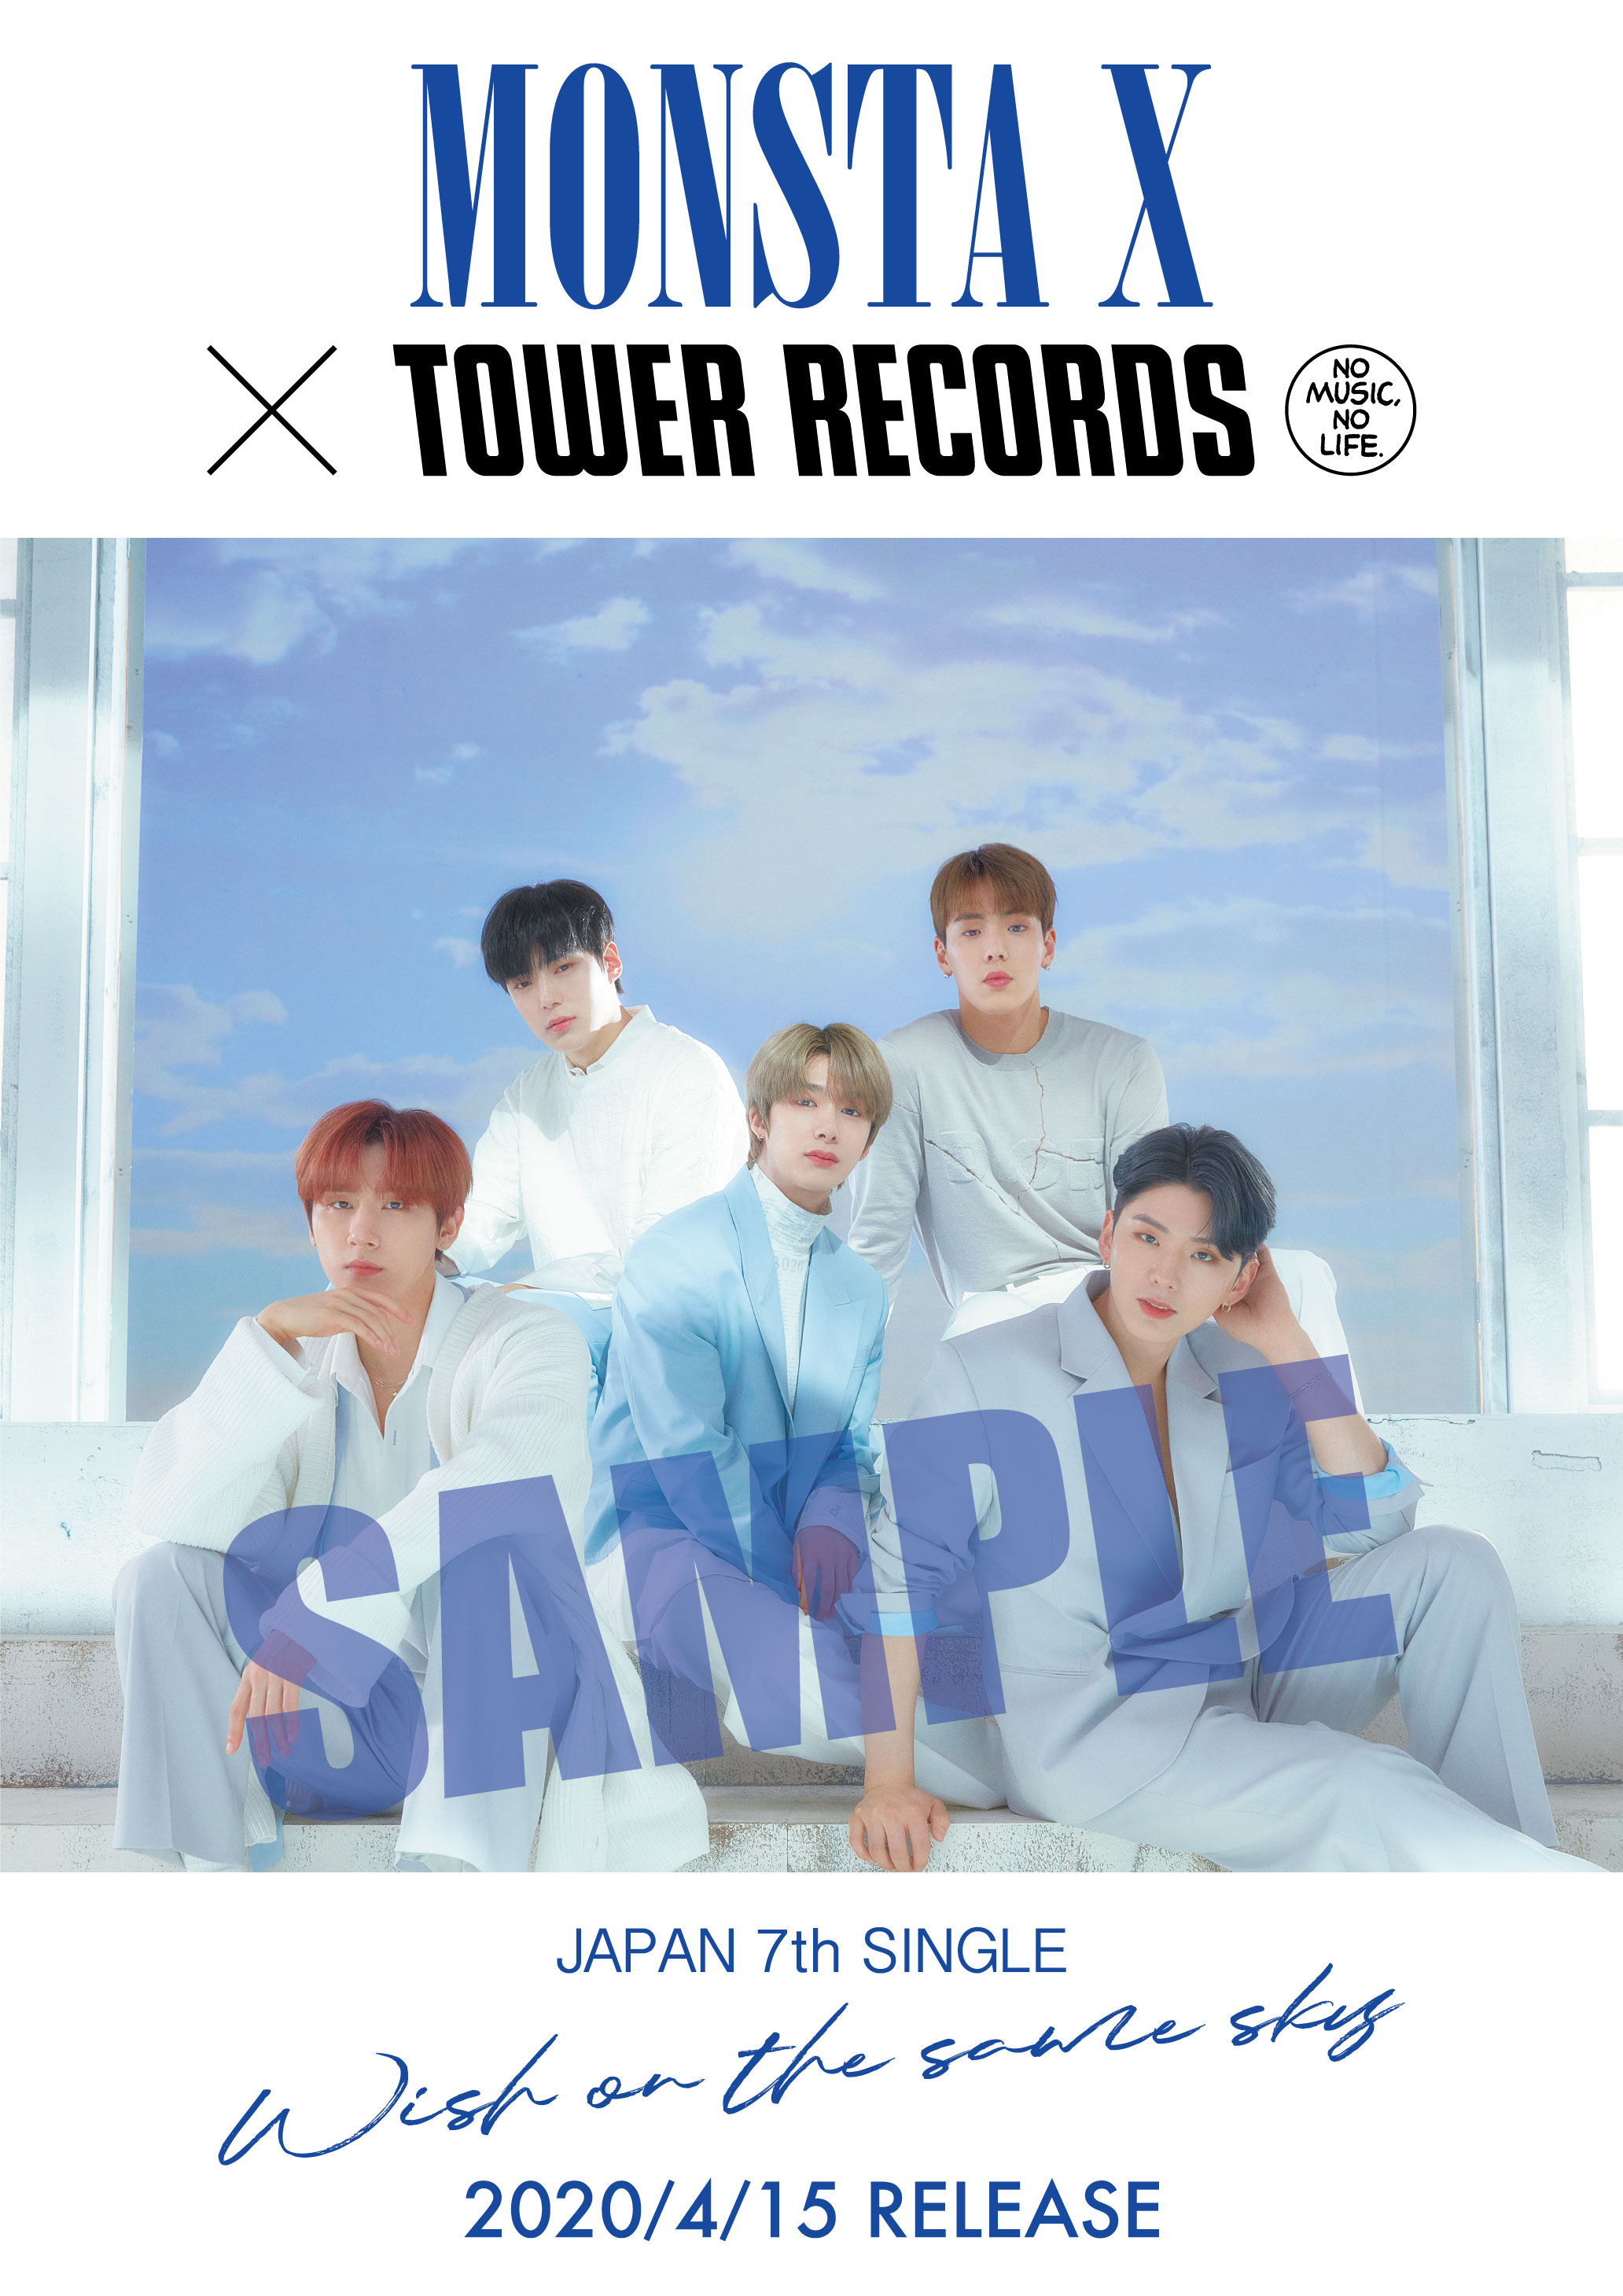 MONSTA X、日本7枚目のシングル『Wish on the same sky』発売記念!【MONSTA X×TOWER RECORS】コラボキャンペーン決定!